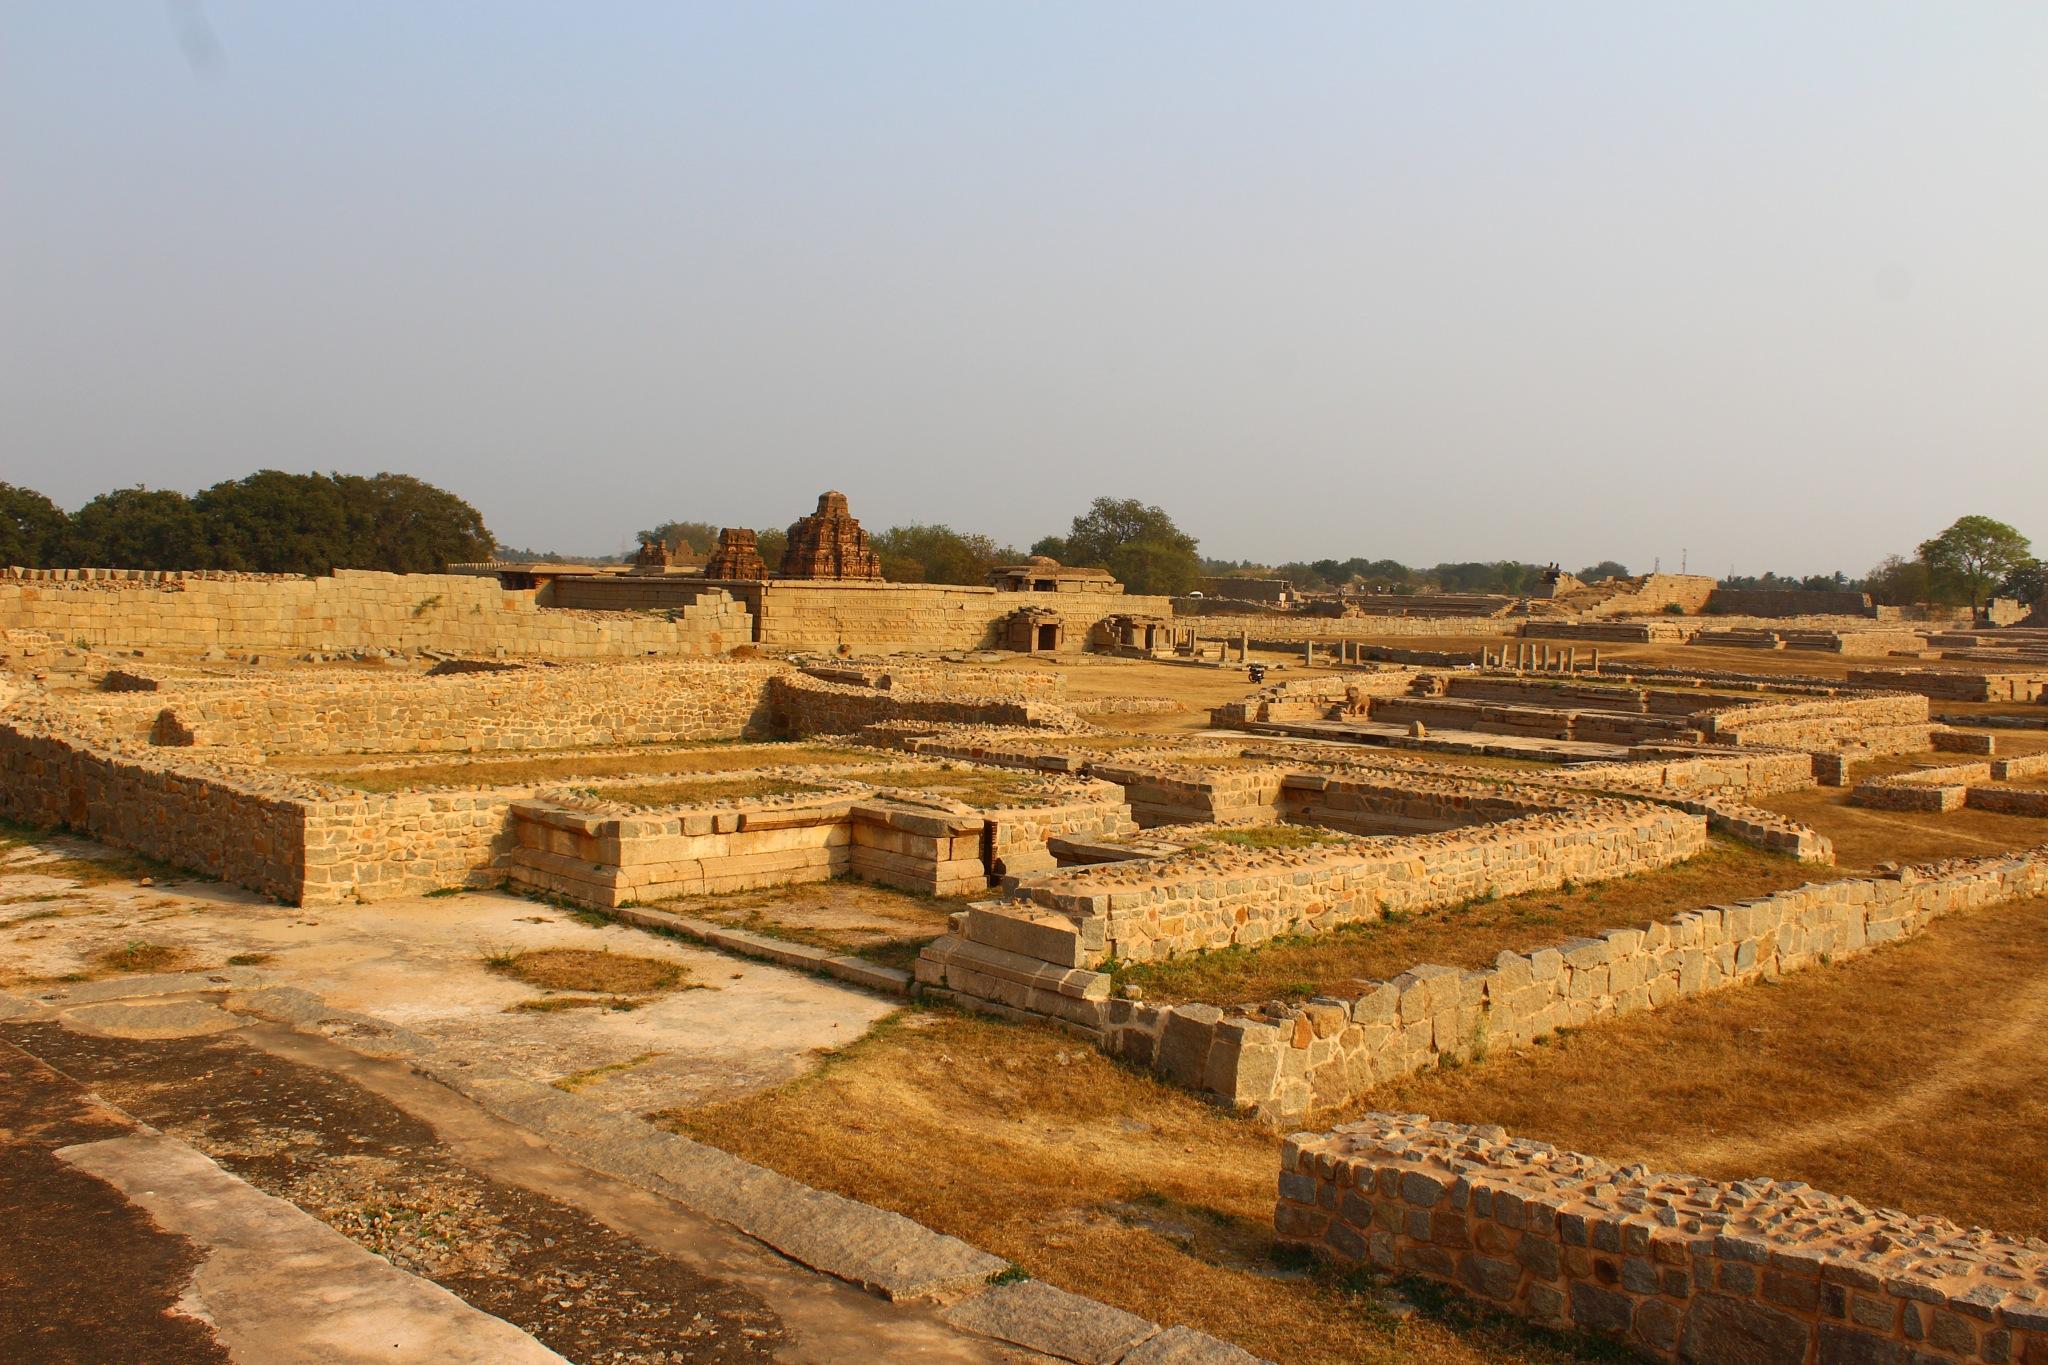 Old vijayanagara kingdom at  Hampi in karnataka india  by Manjappa Rangappanavar